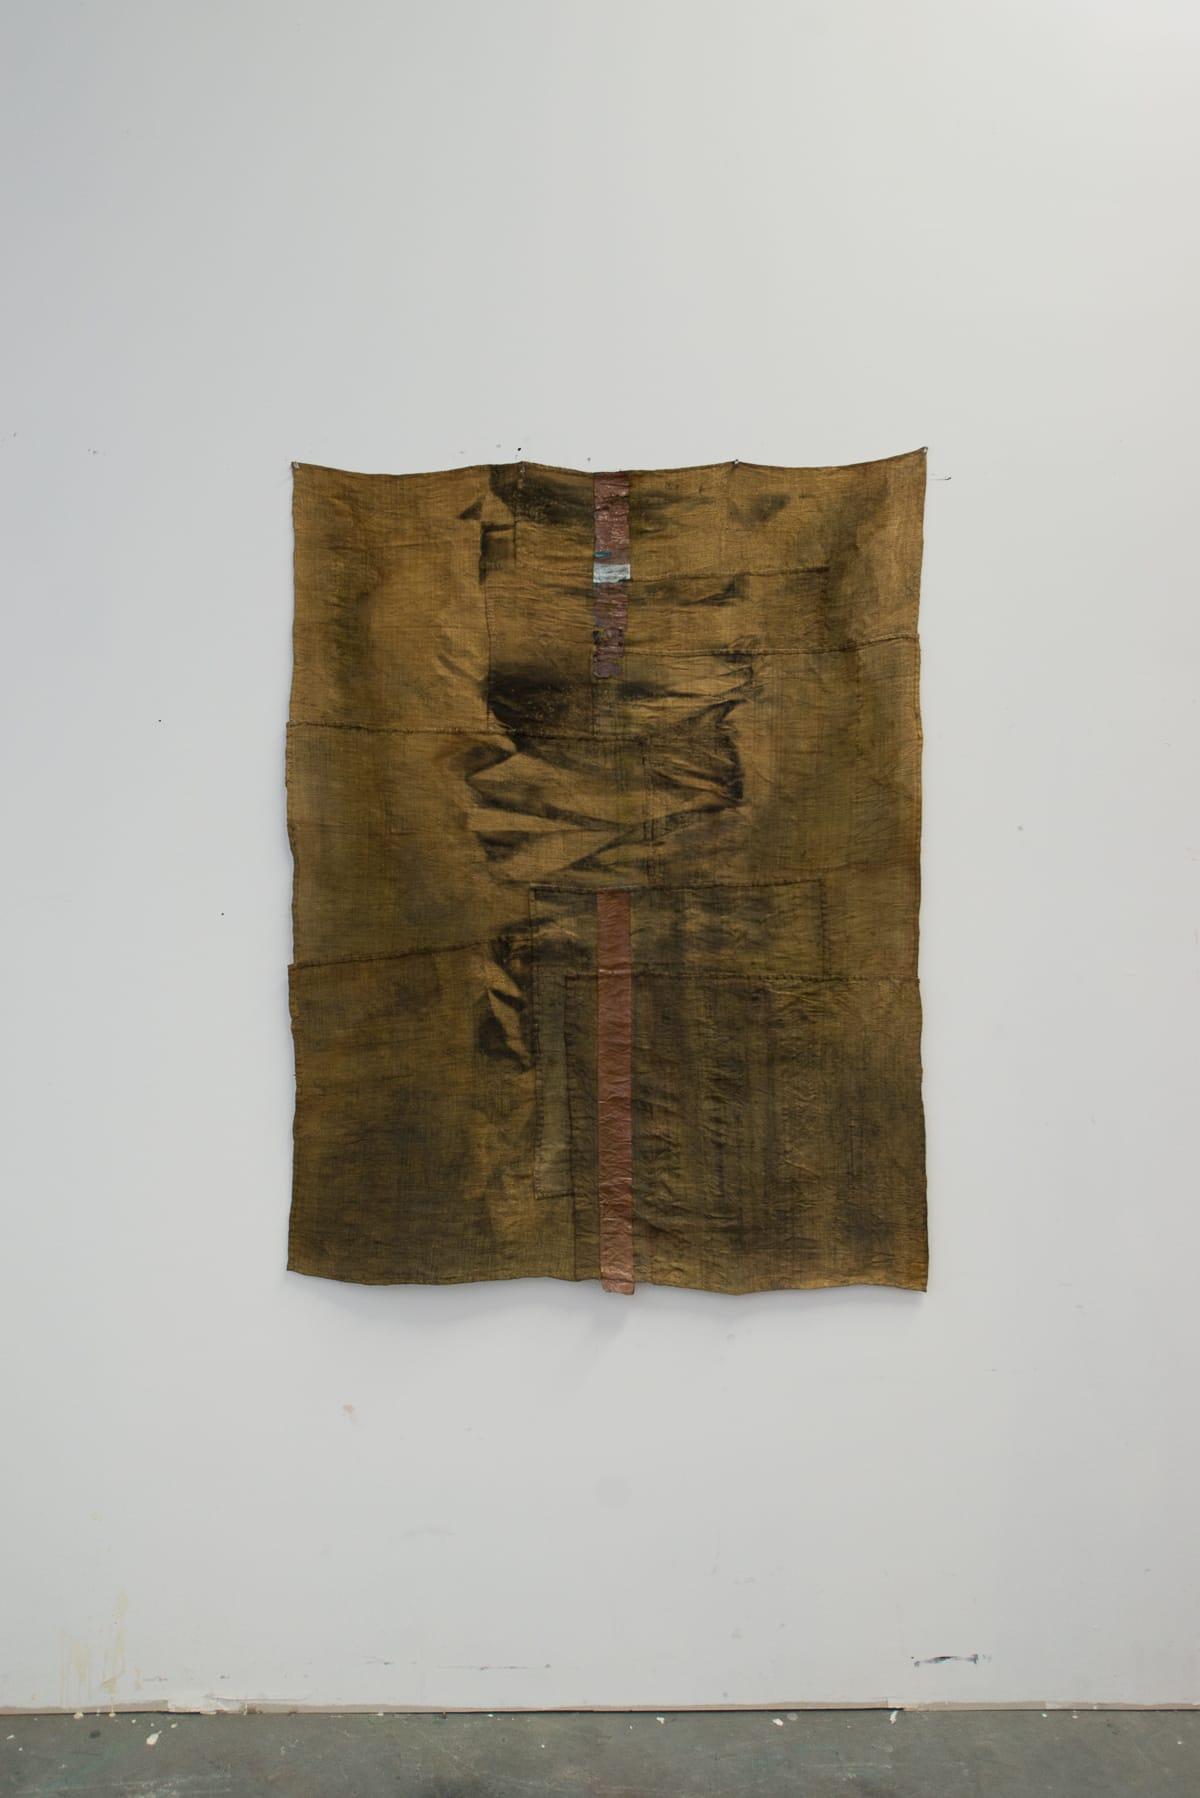 Tahir Carl Karmali, Skin into blankets, 2018